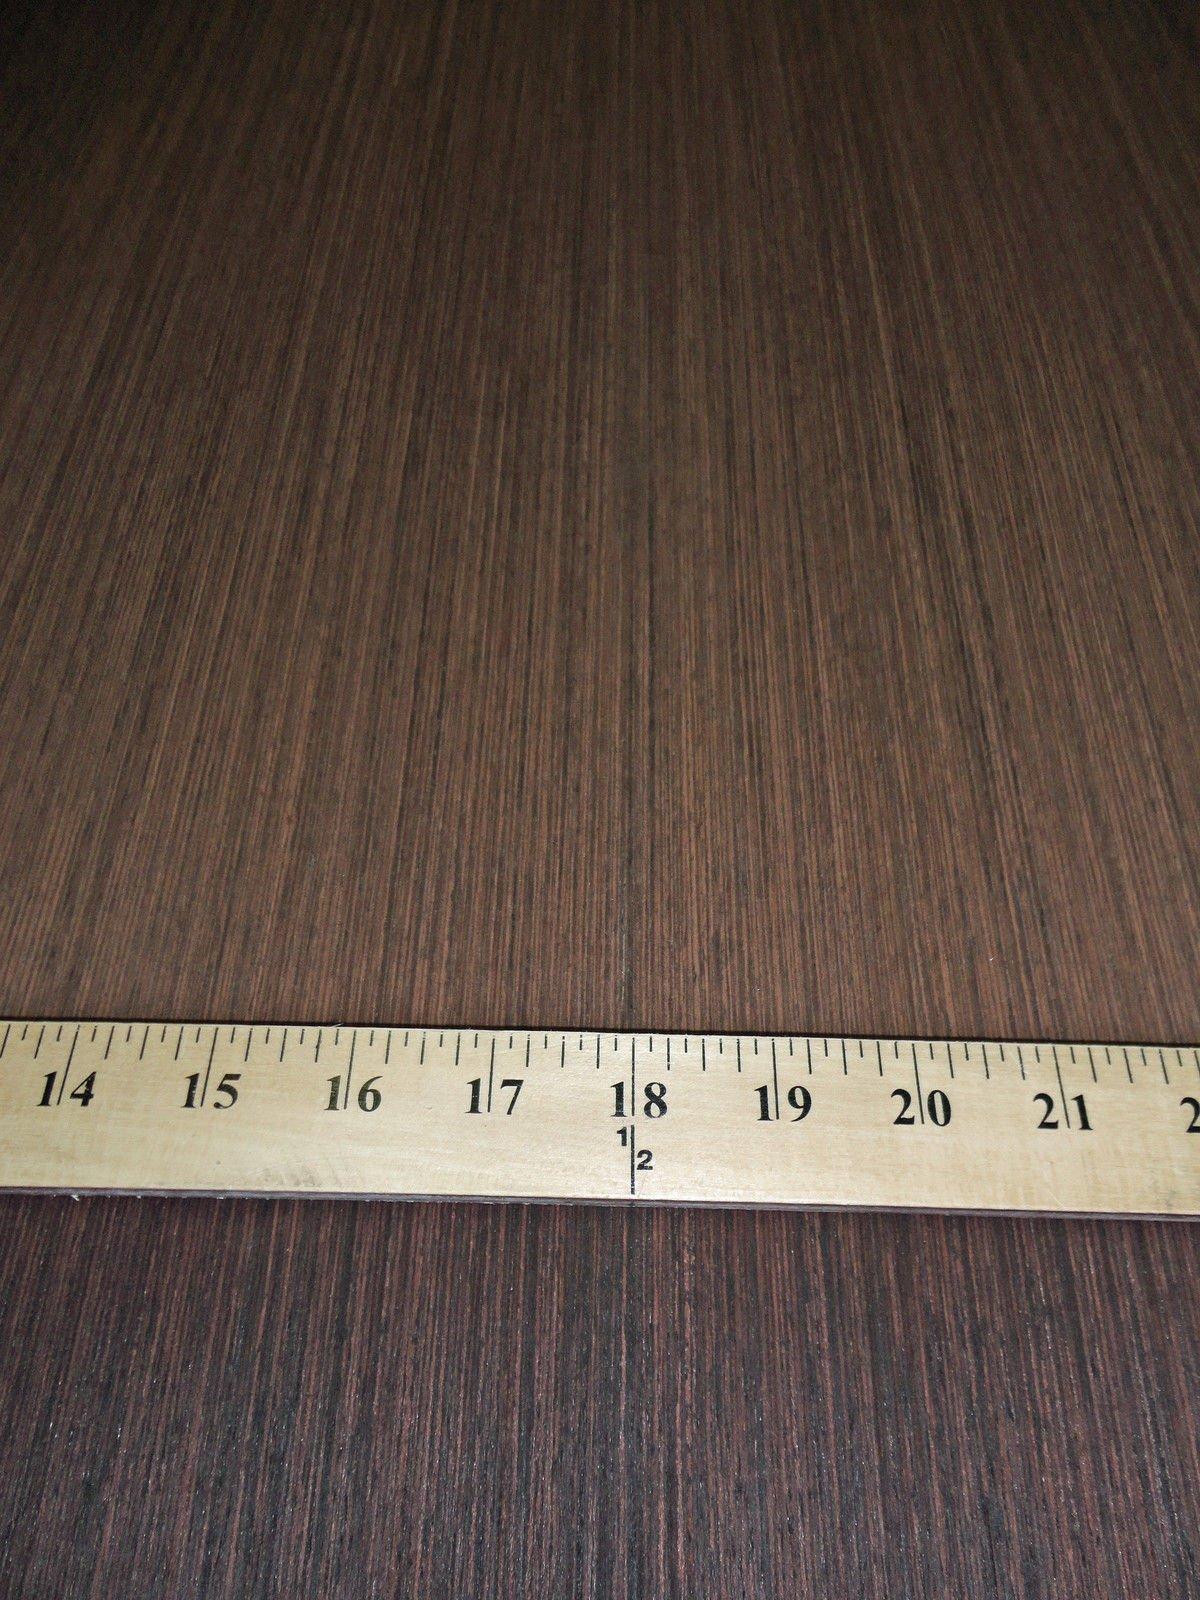 Wenge African (Dark) composite wood veneer 48'' x 96'' on paper backer (# 908)